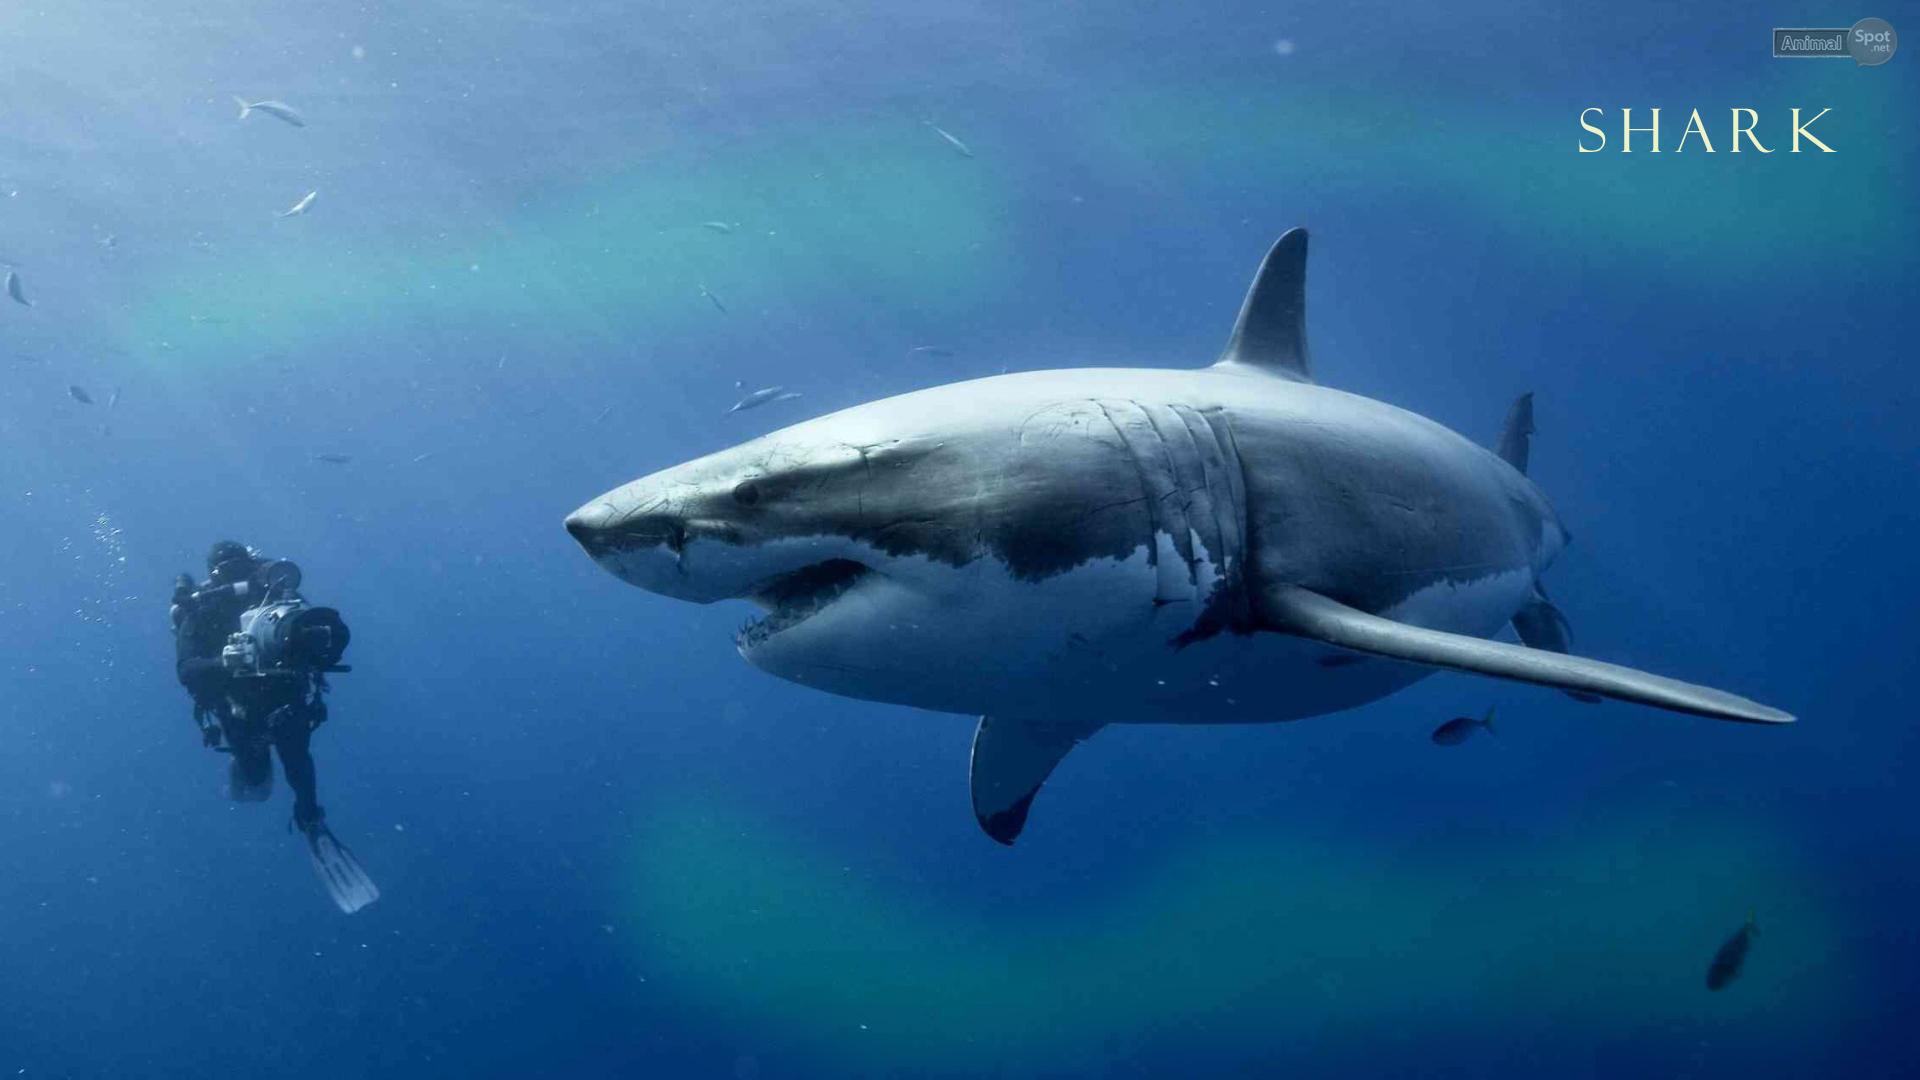 live shark wallpaper - photo #1